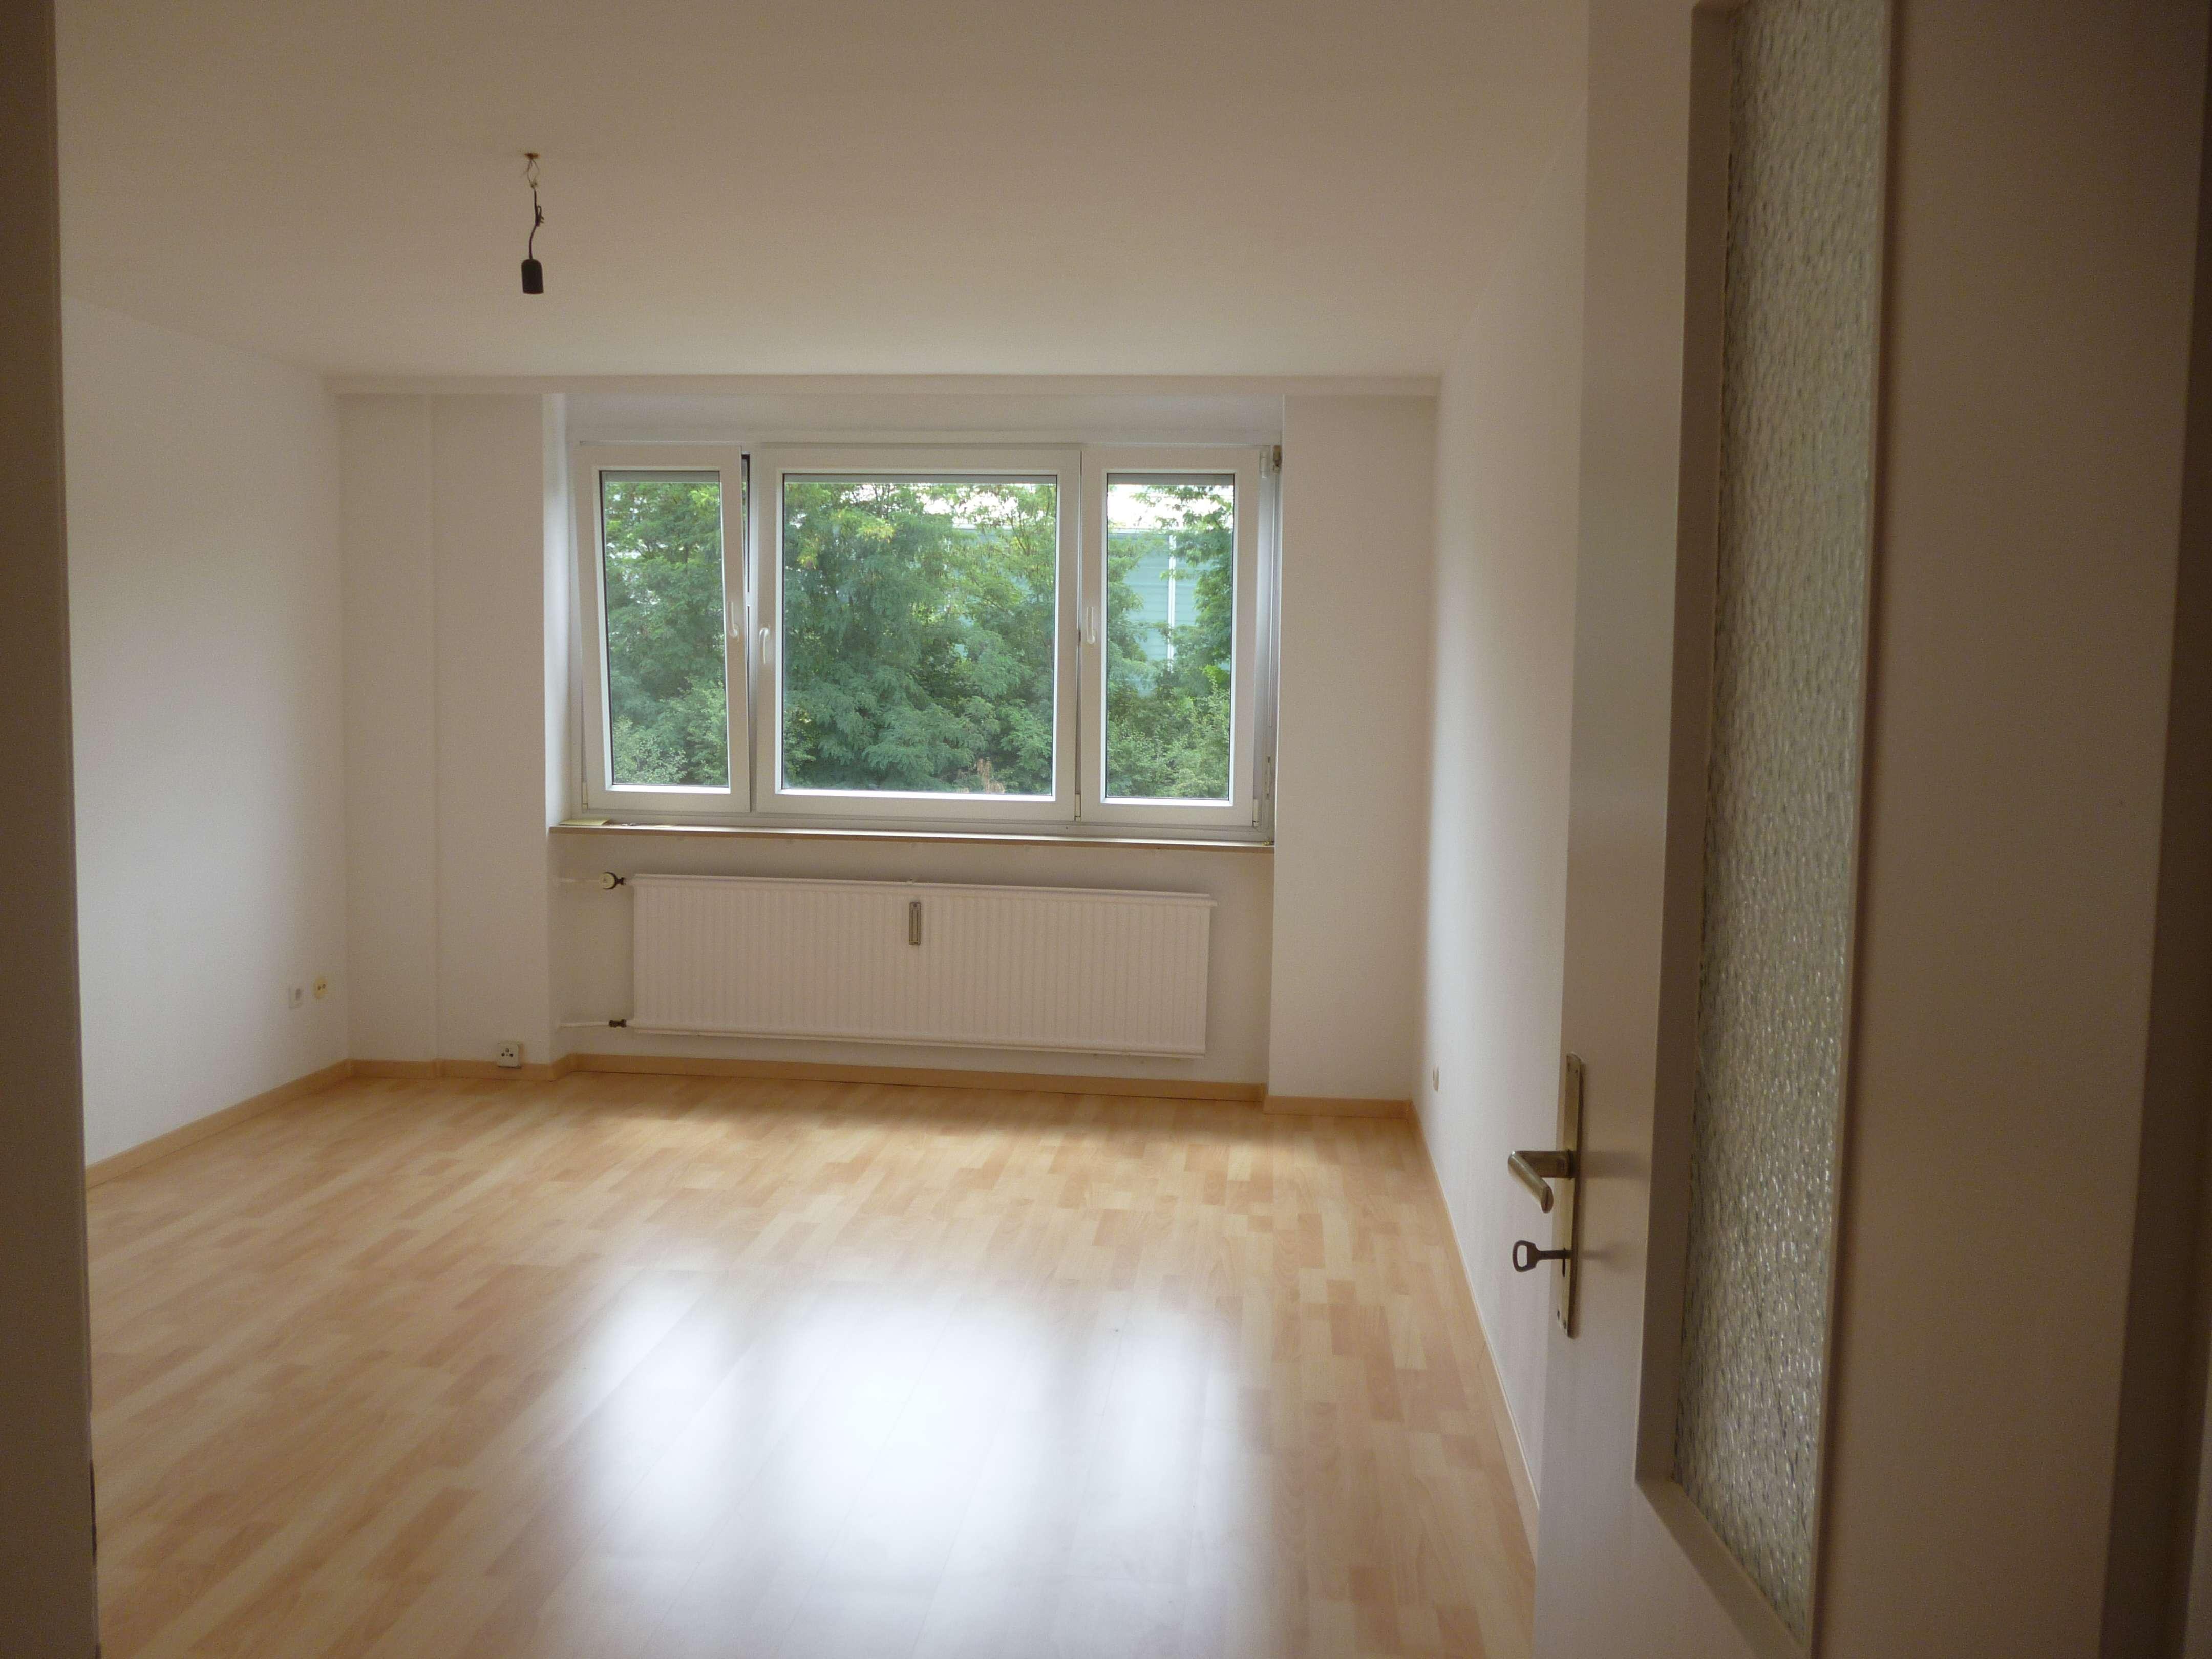 Schöne großzügige 1-Zimmer Wohnung in Nürnberg Nord in Schoppershof (Nürnberg)